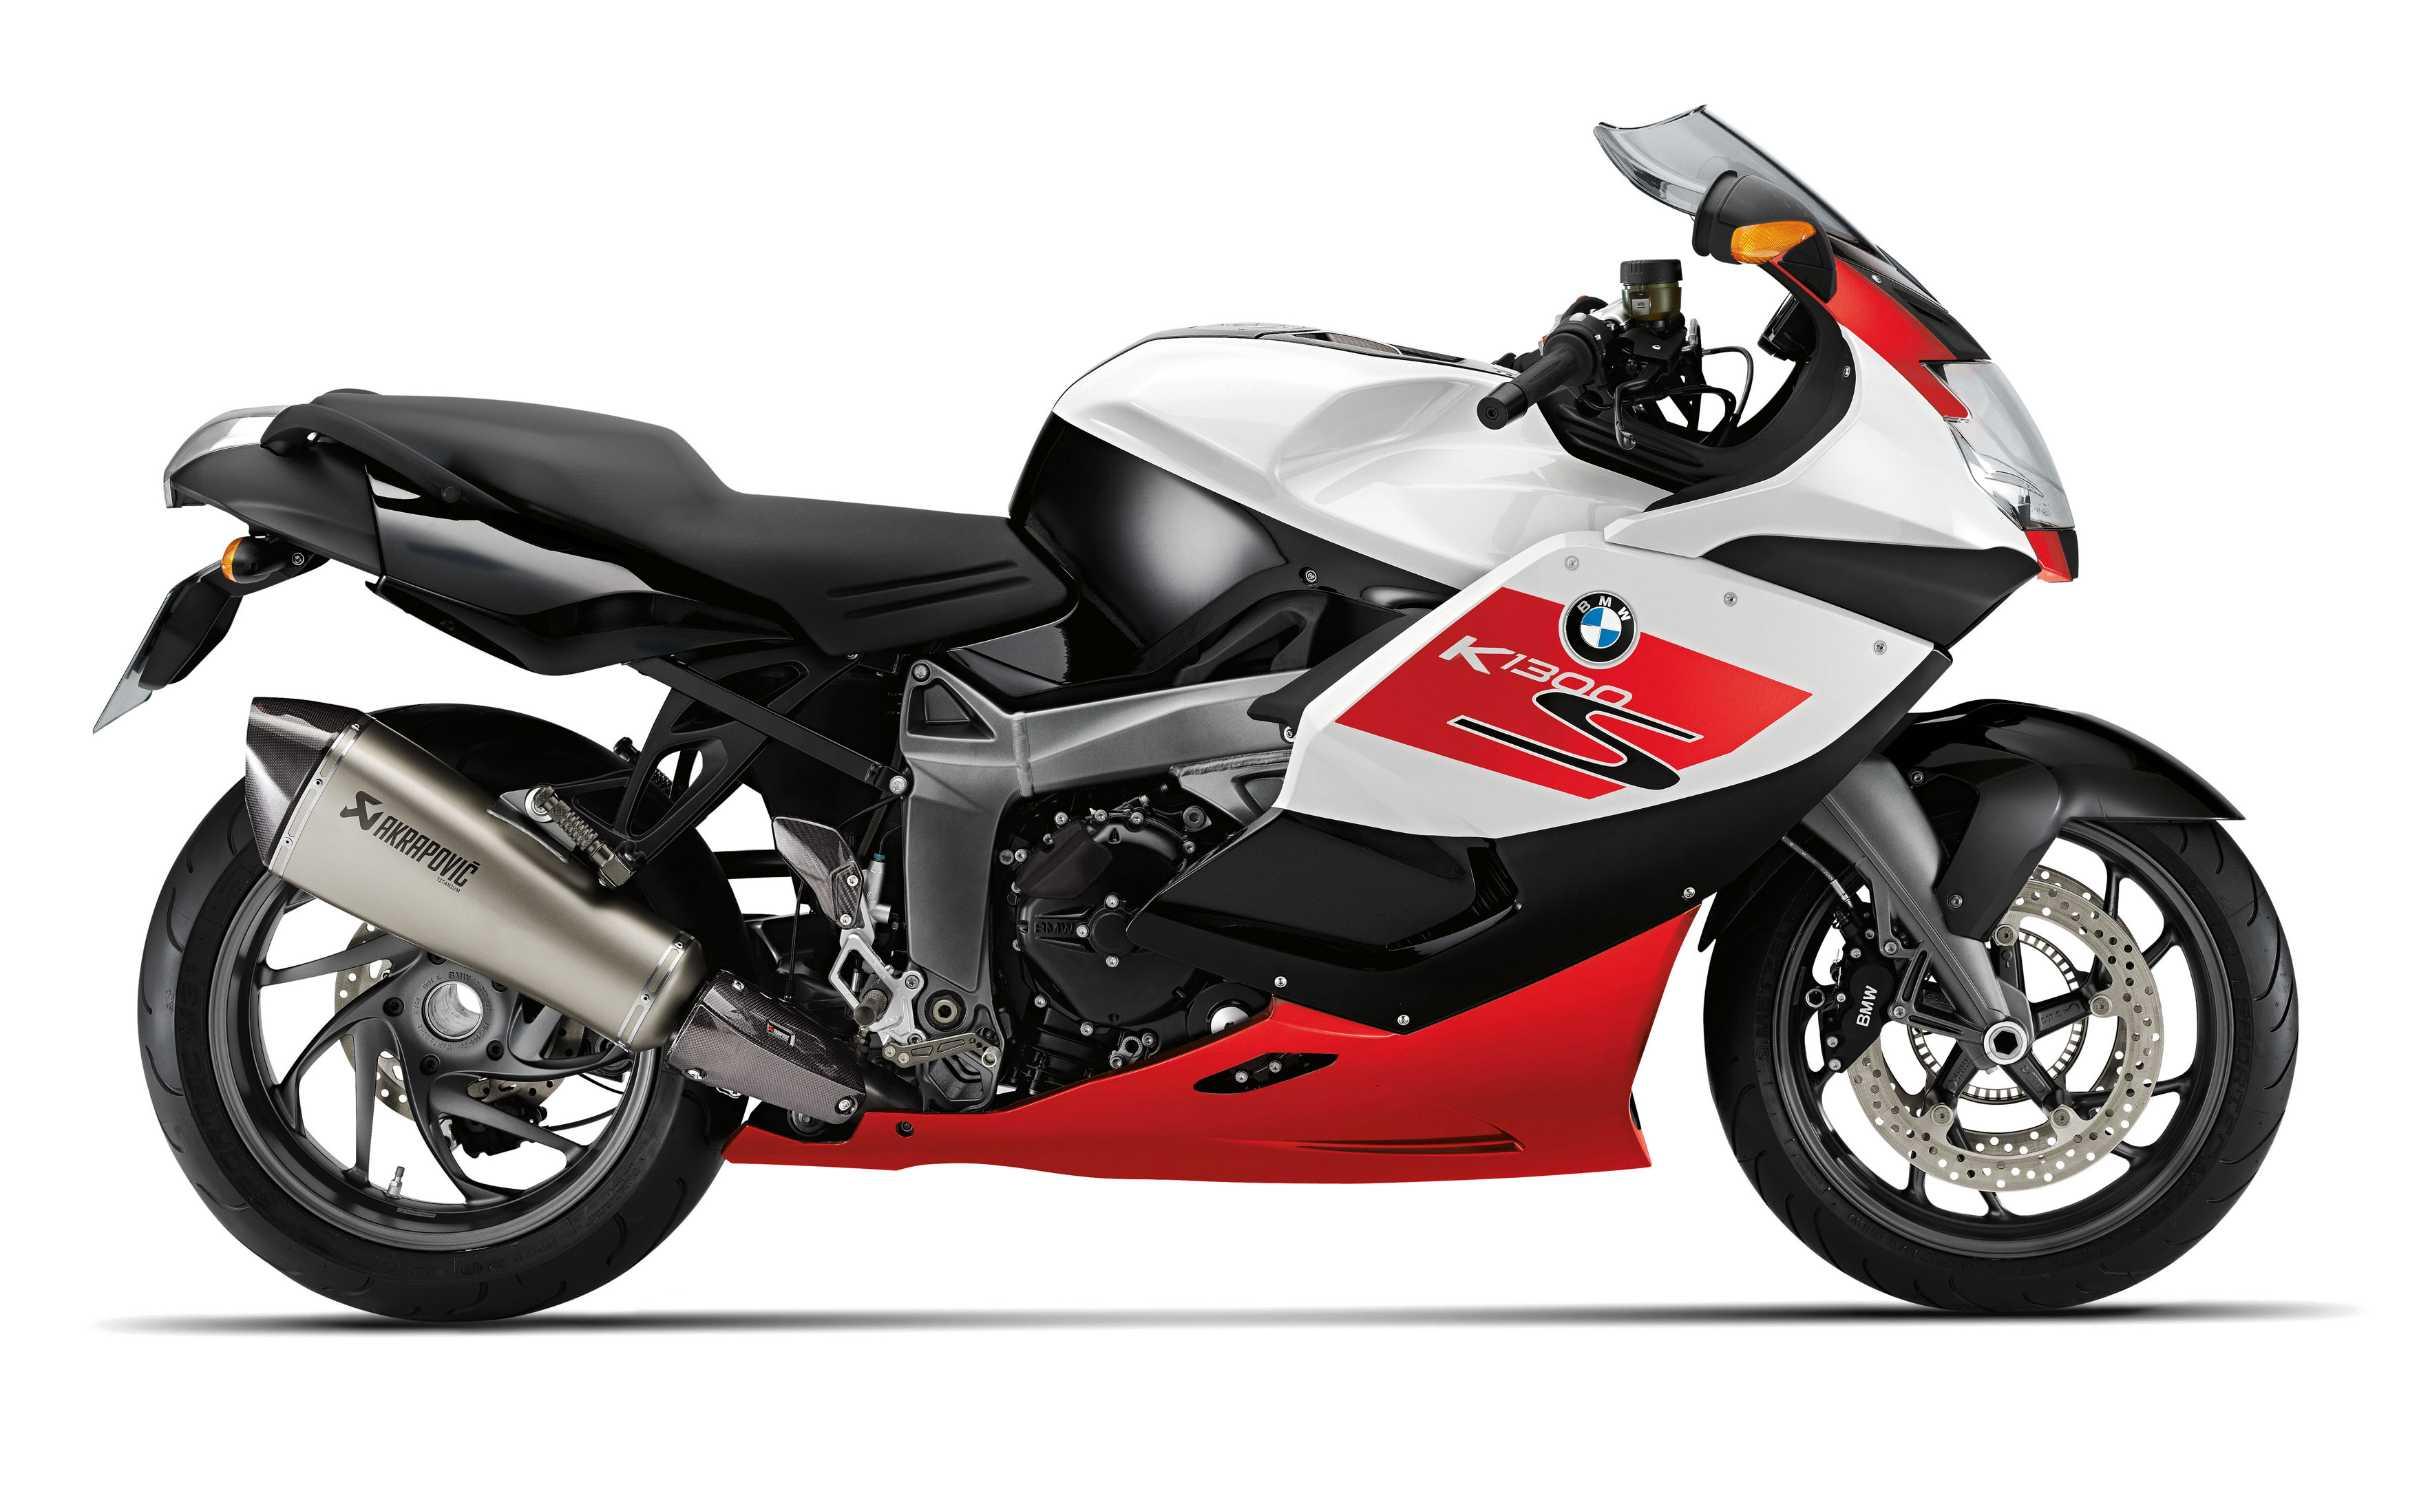 Bmw Motorrad Presents K 1300 S Special Model K 1300 S 30 Jahre K